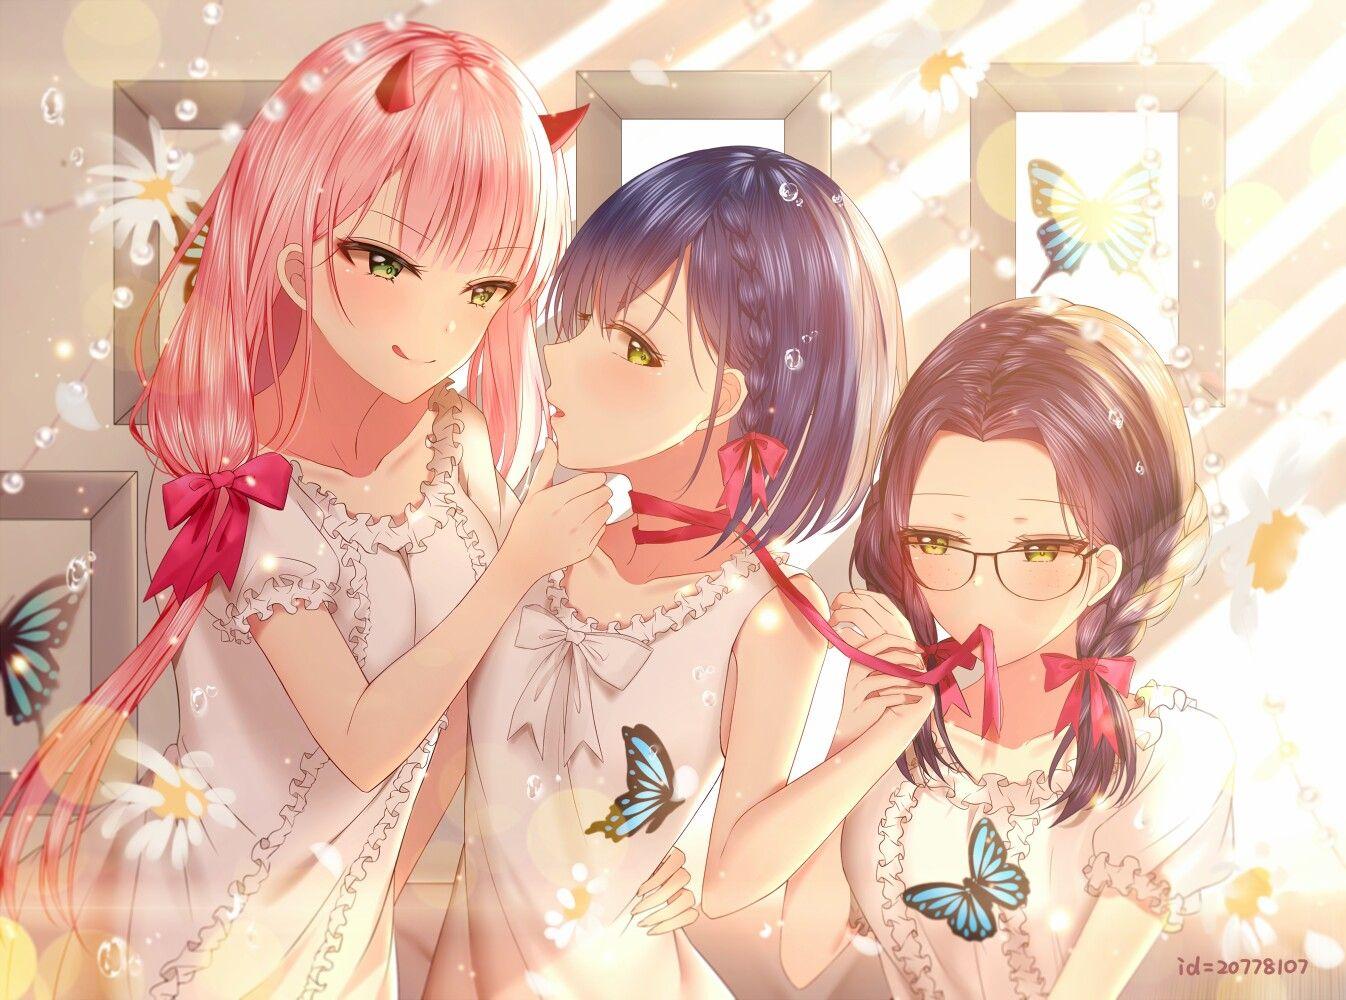 Zero Two, Ichigo, Ikuno Anime, Nghệ thuật, Nghệ thuật anime